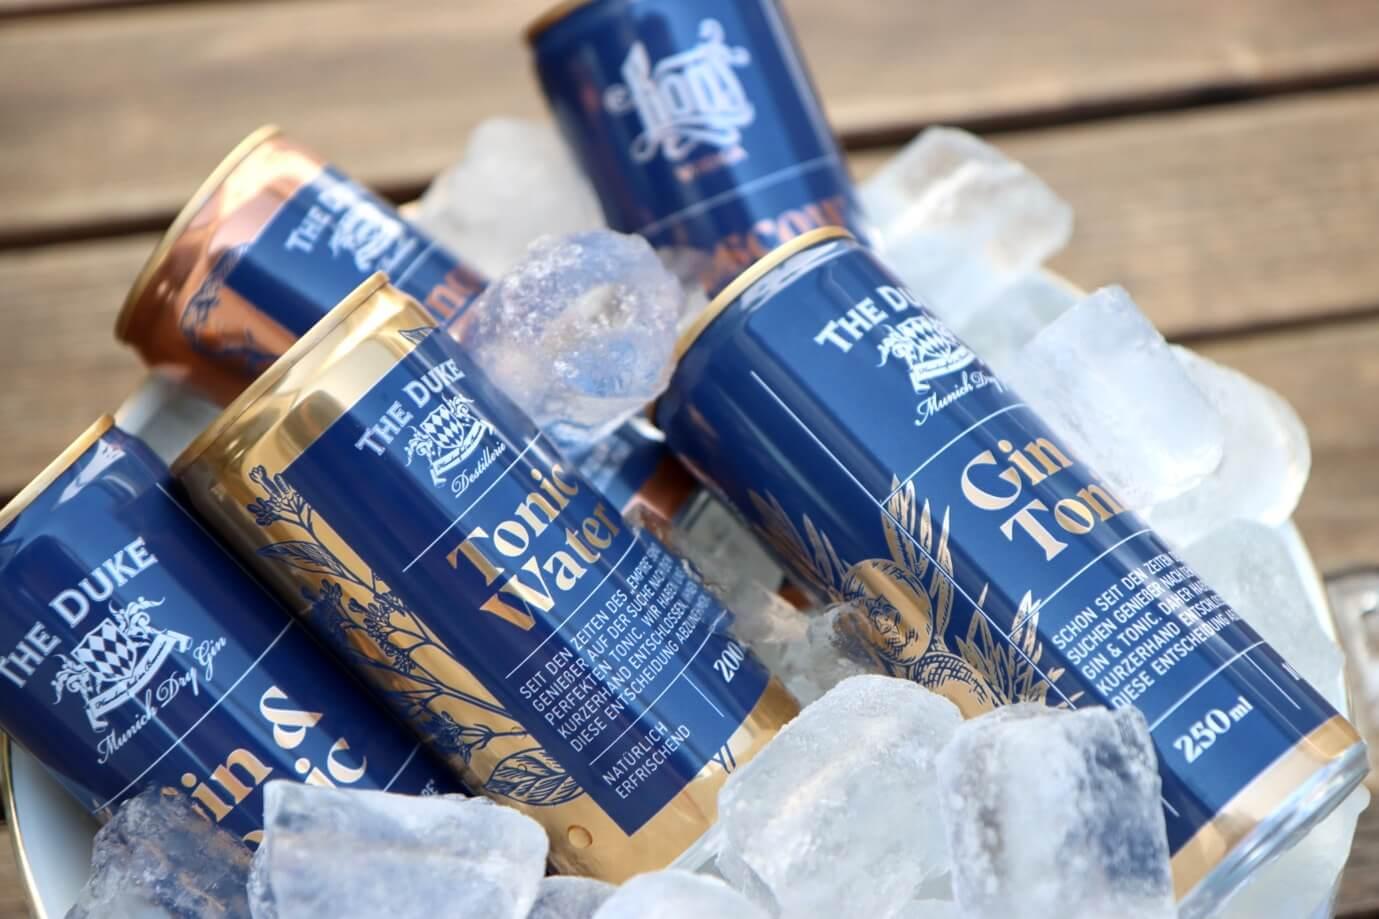 THE DUKE Tonic Water, Gin & Tonic in der Dose im Eis